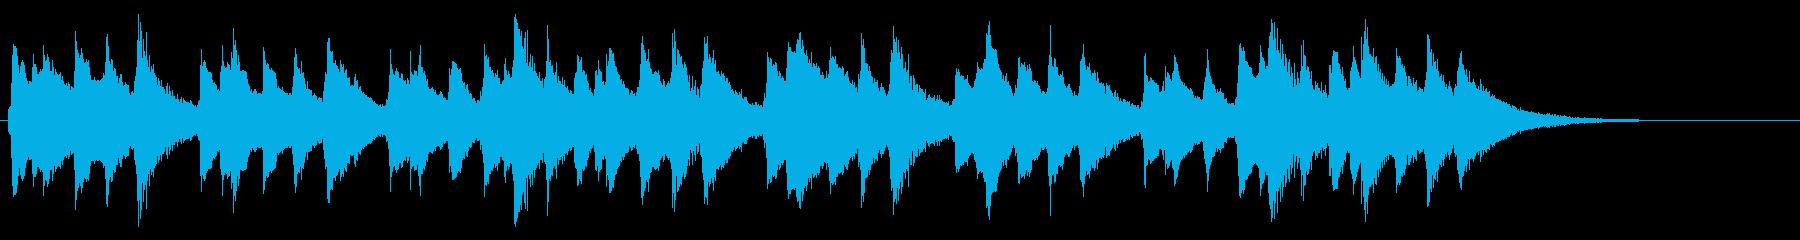 ★ Classic ★ Happy Birthday ★ Music Box ★'s reproduced waveform